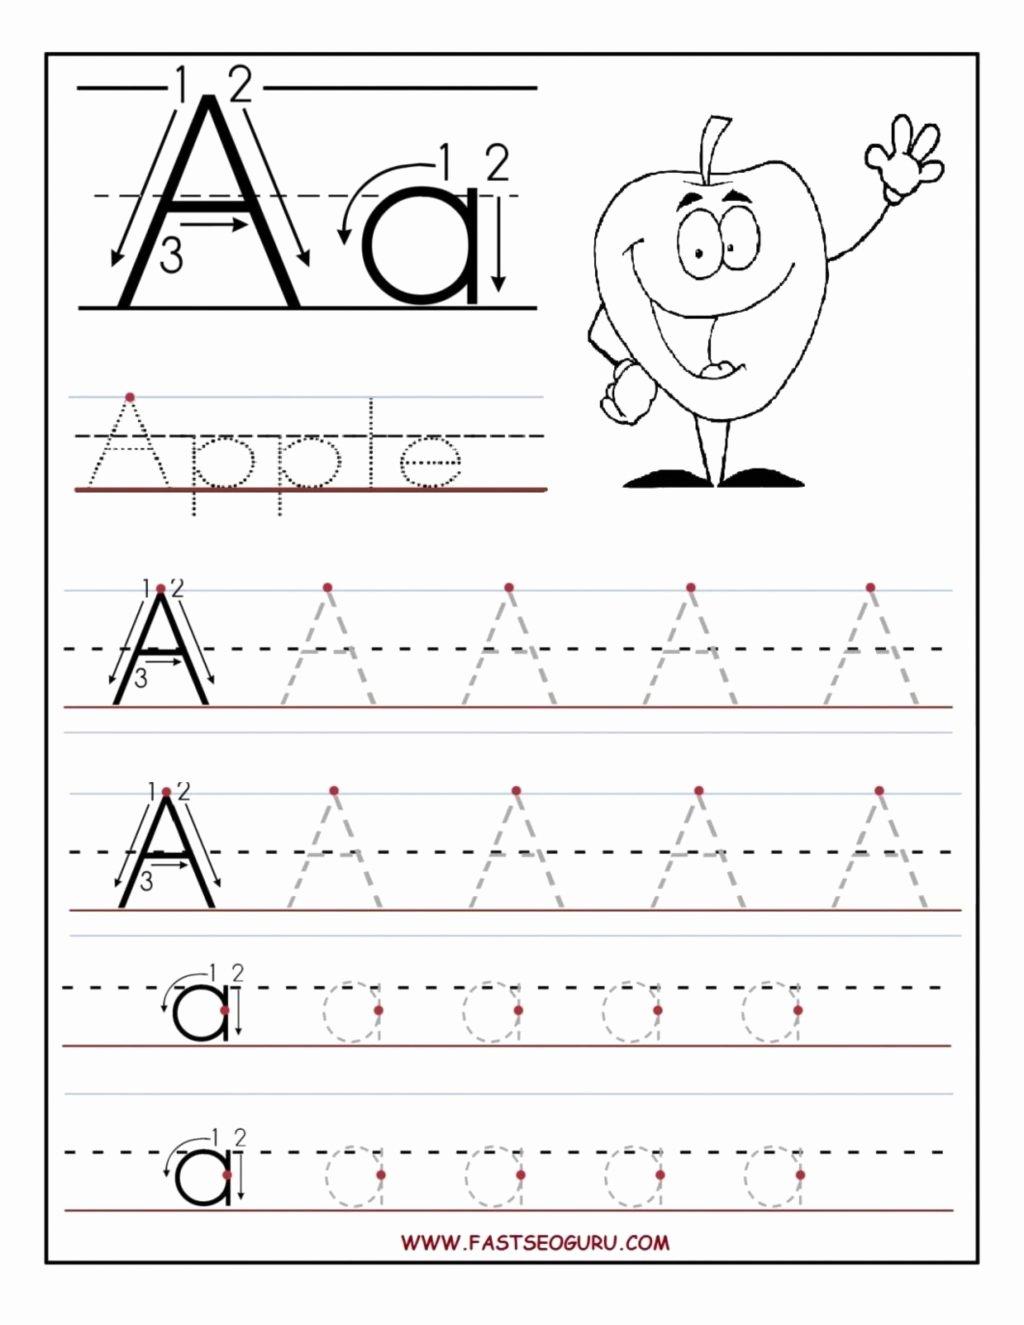 Worksheets for Preschoolers Alphabet Best Of Worksheet Worksheet Trace Letters Tracing Worksheets for